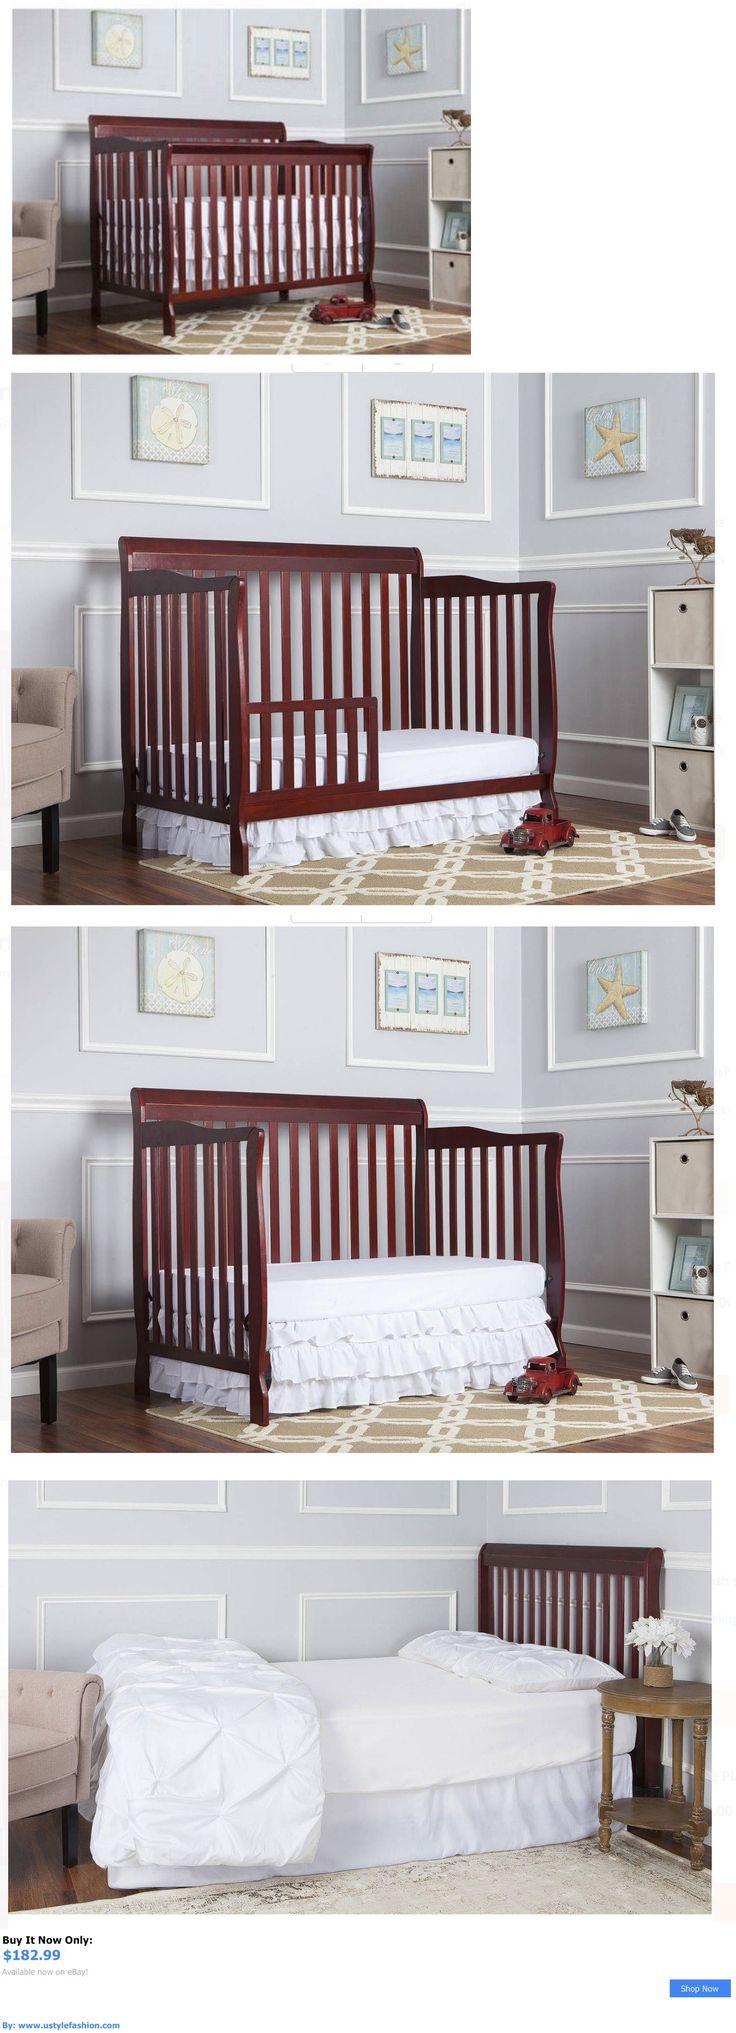 Baby bedding crib sets - Nursery Furniture Sets Baby Bedding Crib Sets Neutral And Furniture For Boys Girls 5 In